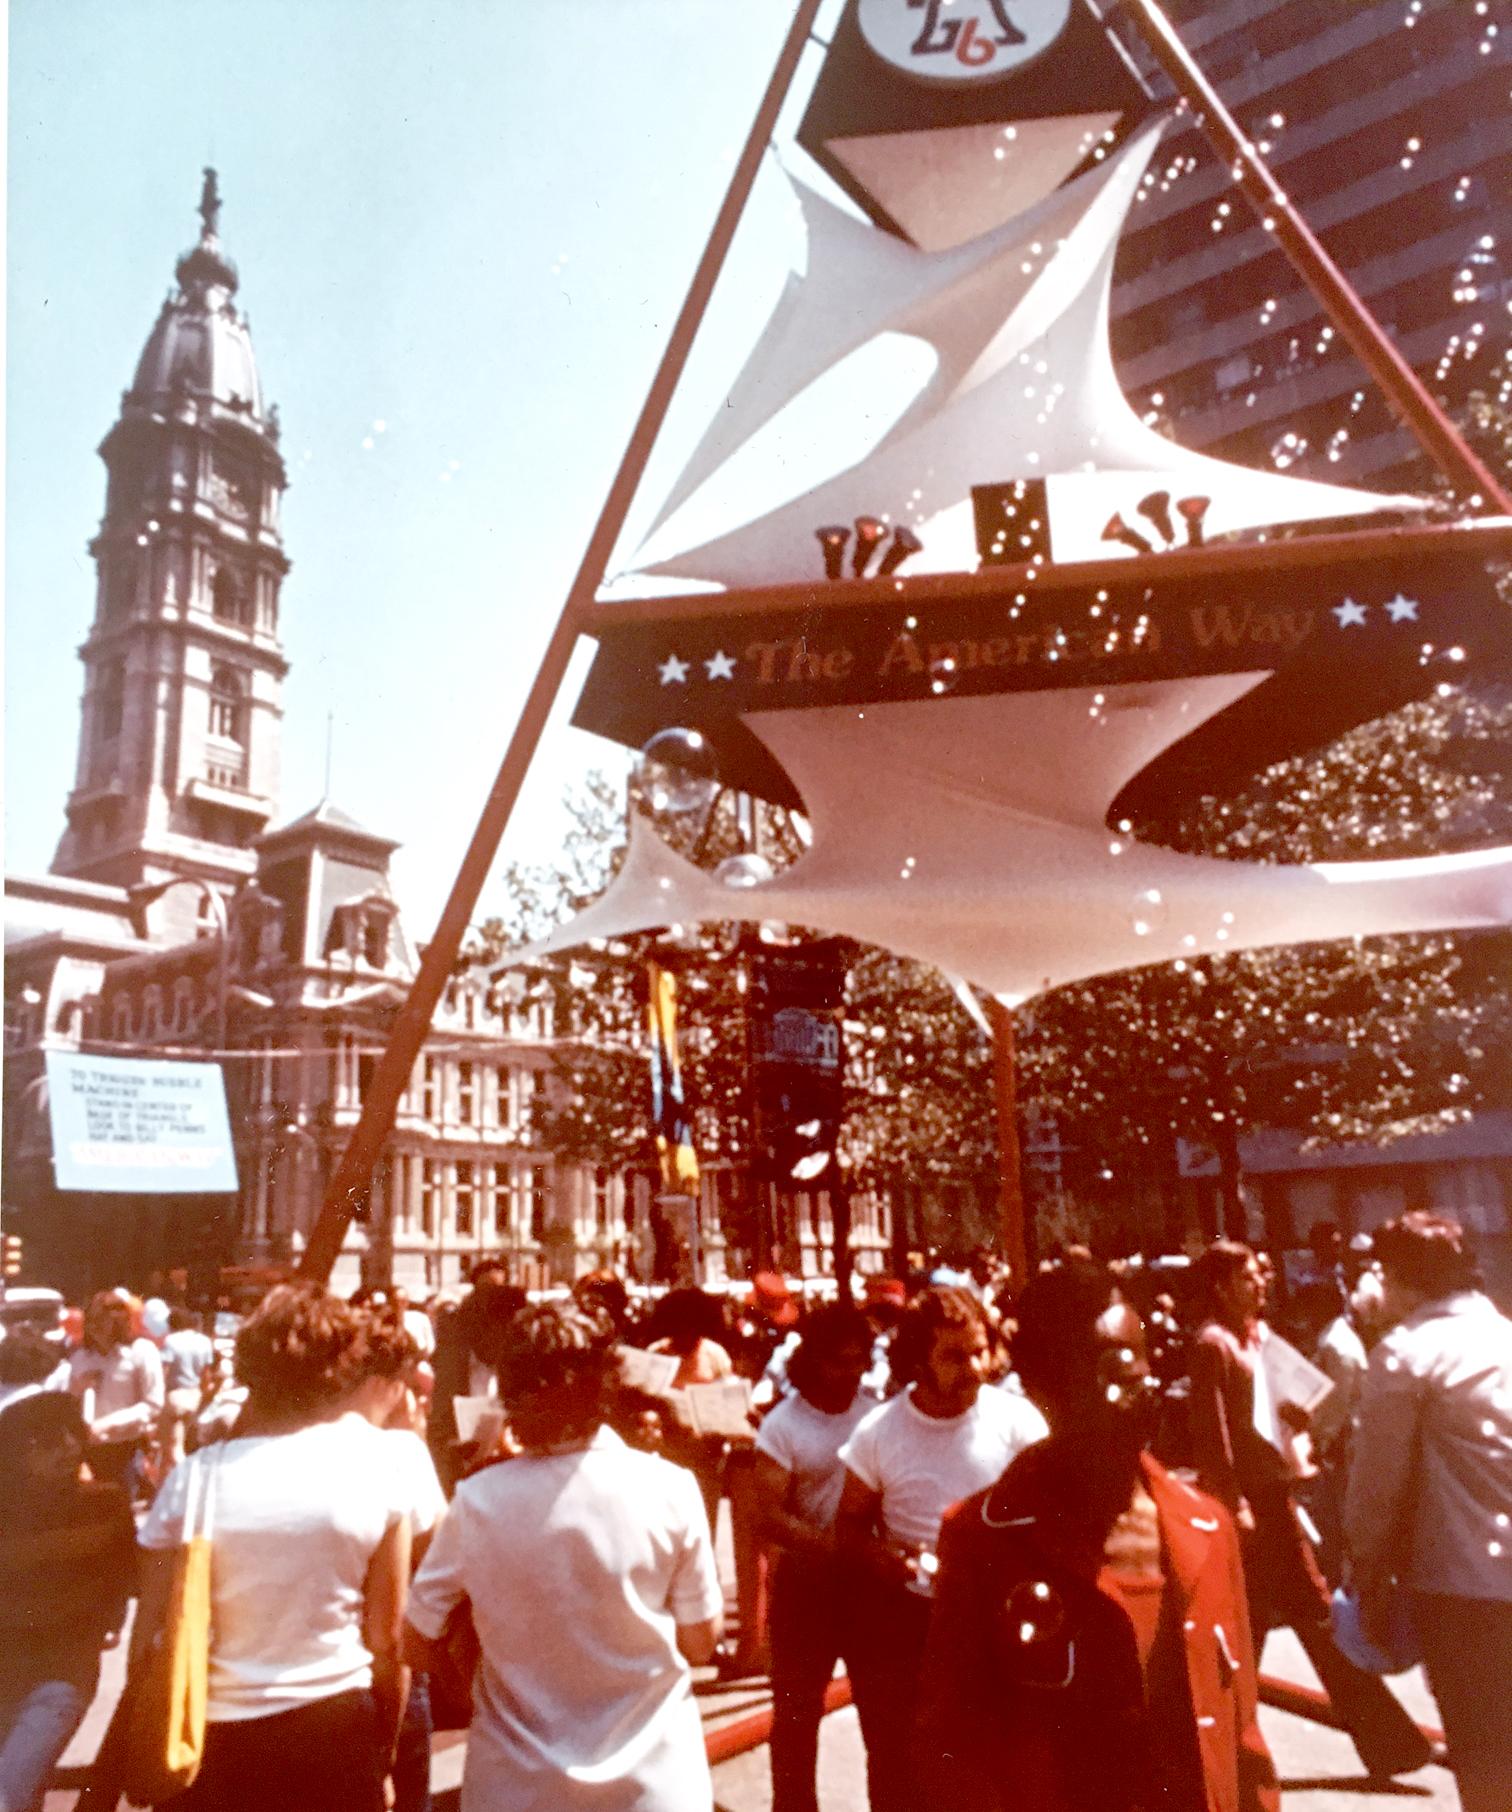 Remo Saraceni 1976 Bicenntenial, Bubble Machine_ sculpture in Philadelphia